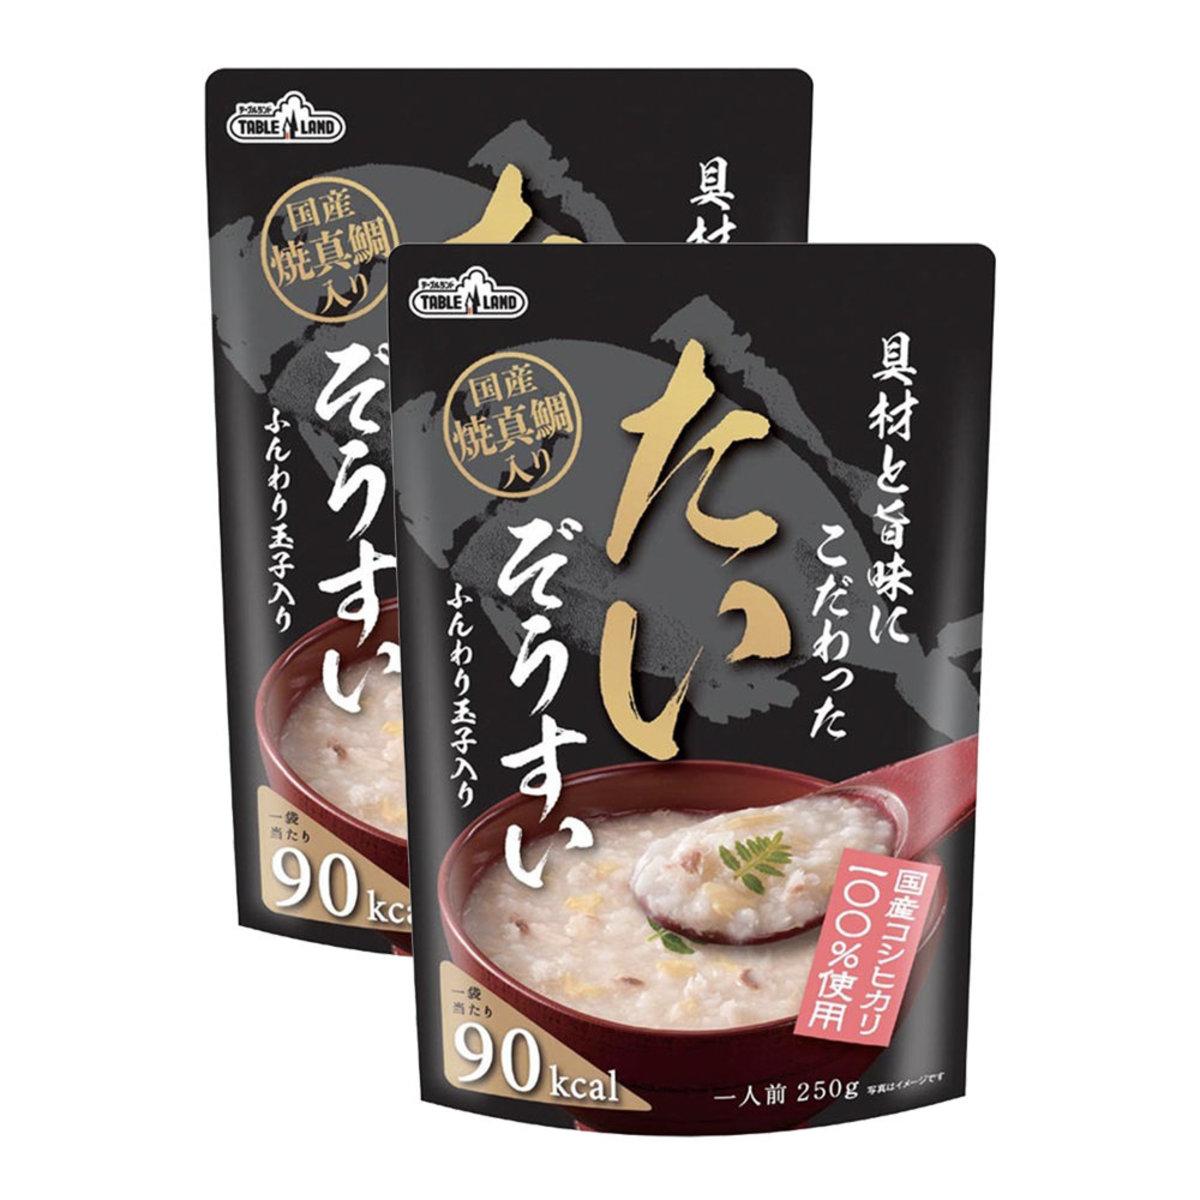 Koshihikari Rice Porridge 250g - Egg Snapper ×2(Pink)